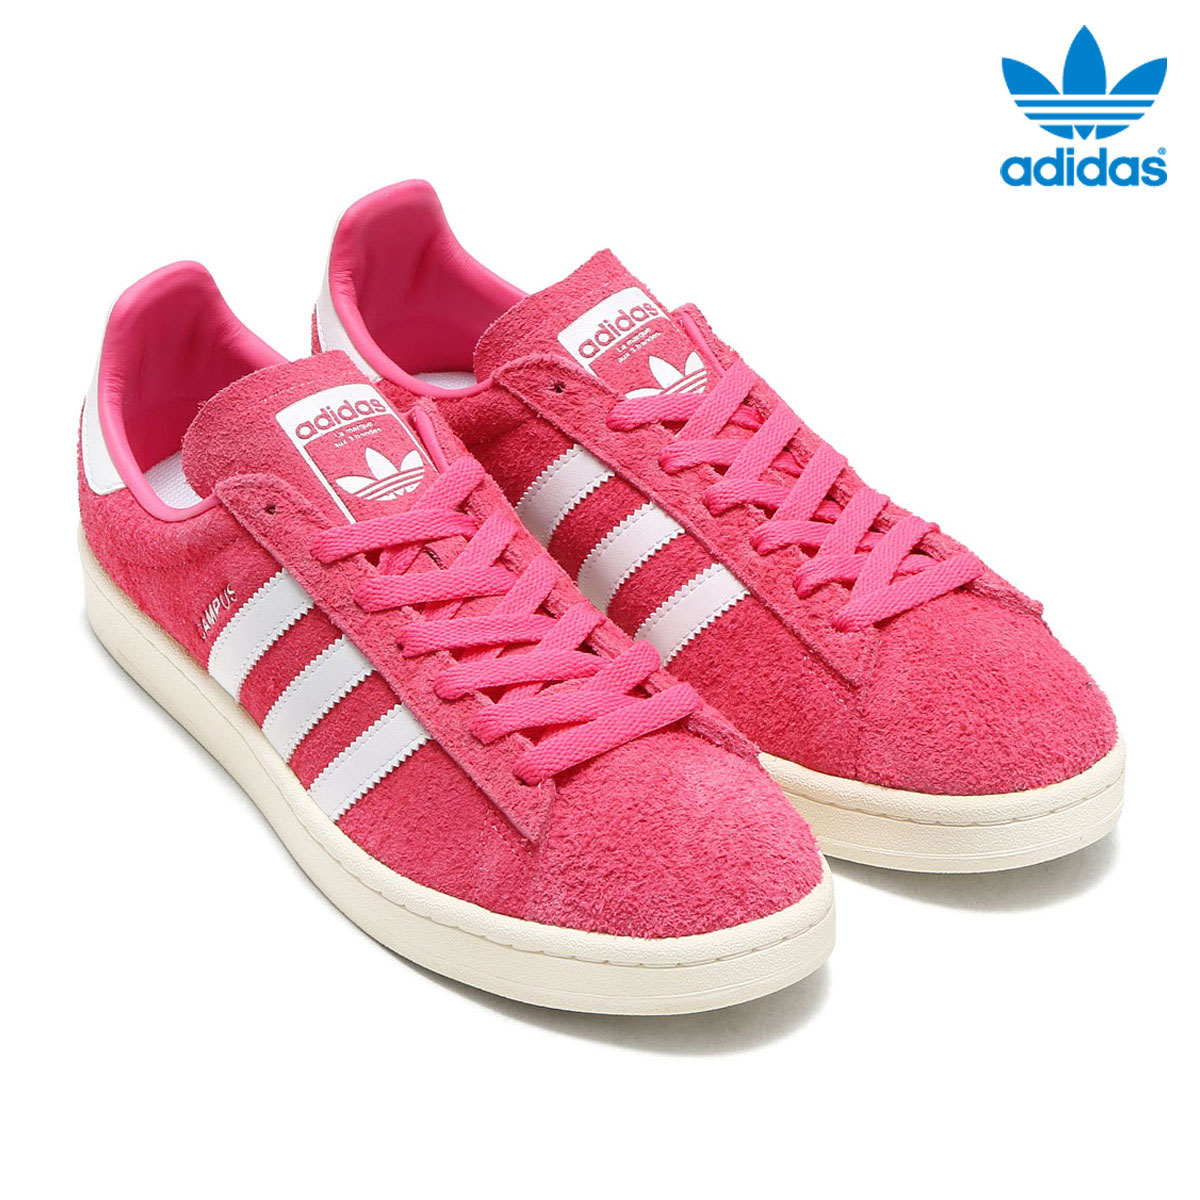 adidas スニーカー レディース ピンク